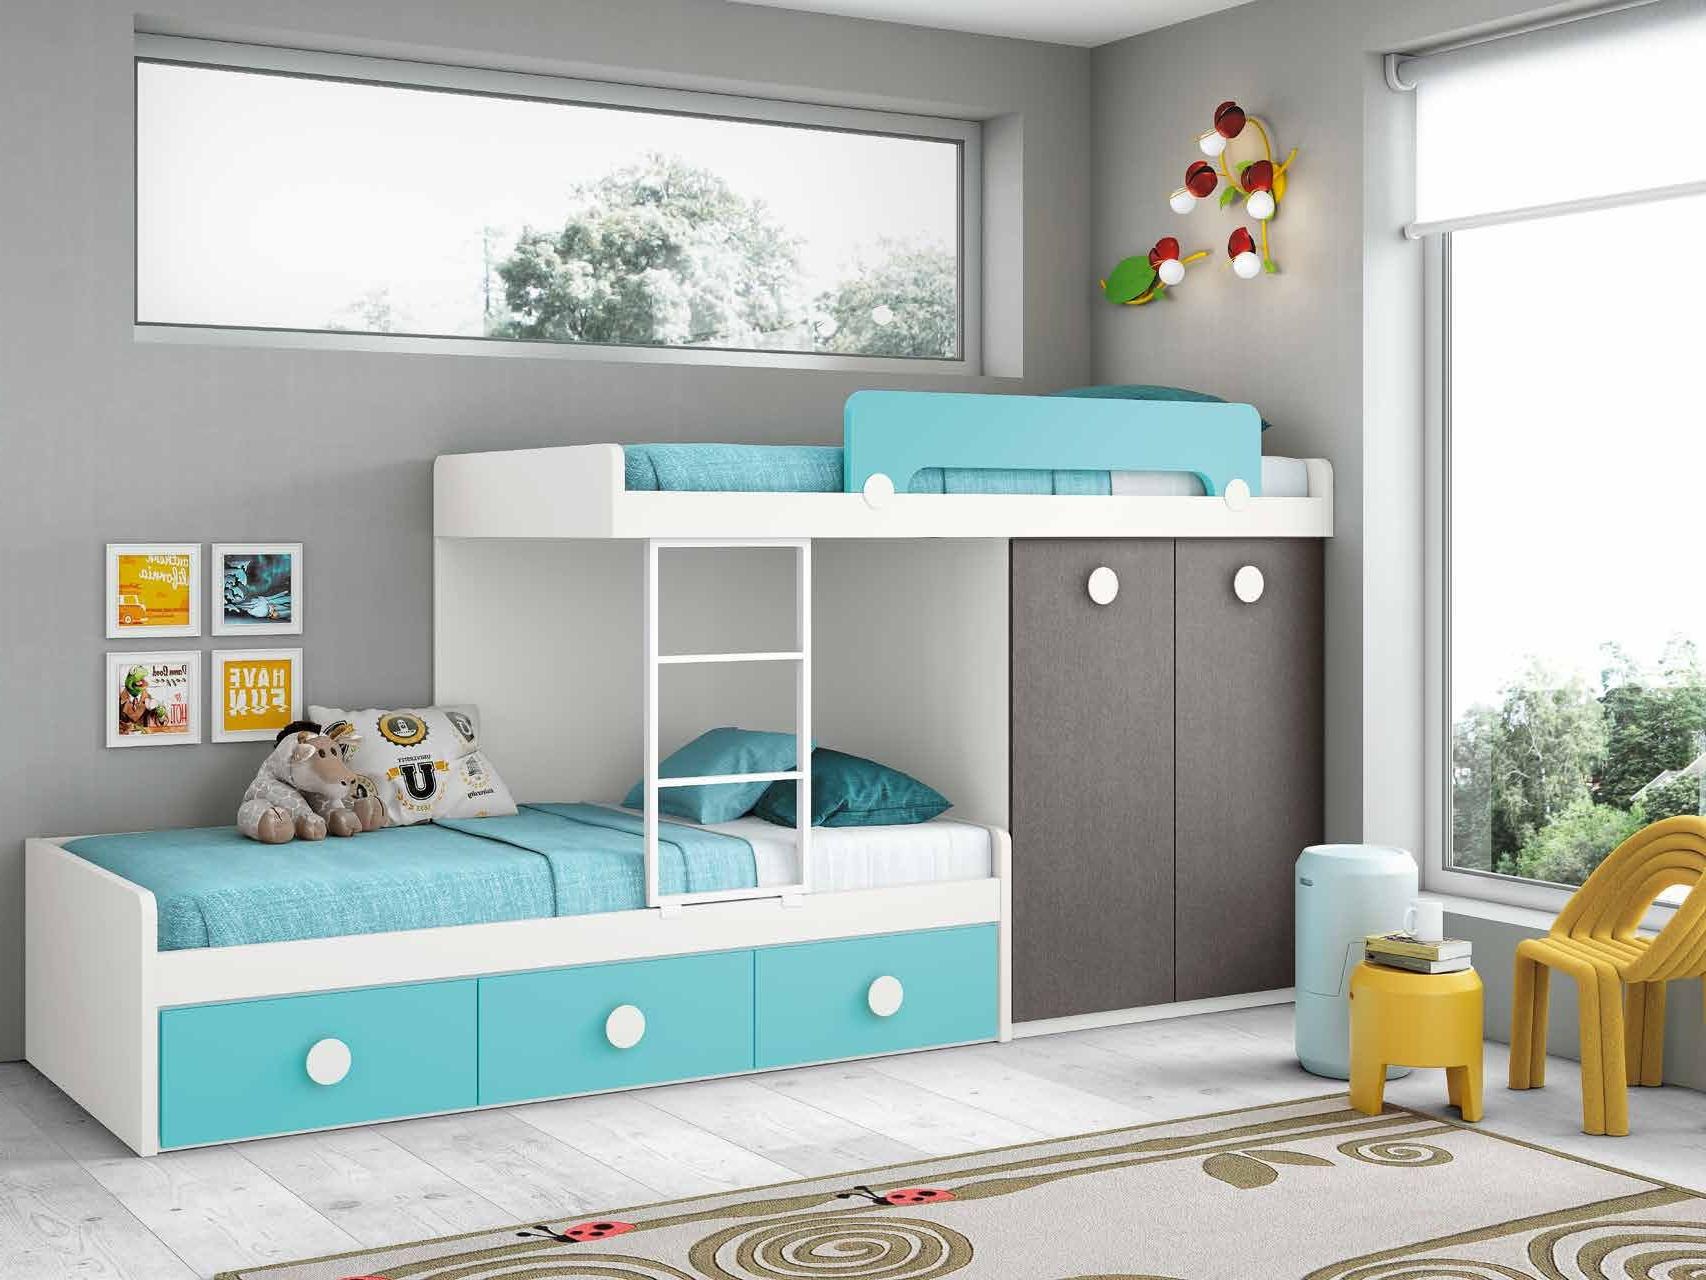 Muebles Castellon Baratos Tldn Muebles Baratos Castellon Awesome El Bonito Dormitorios Juveniles